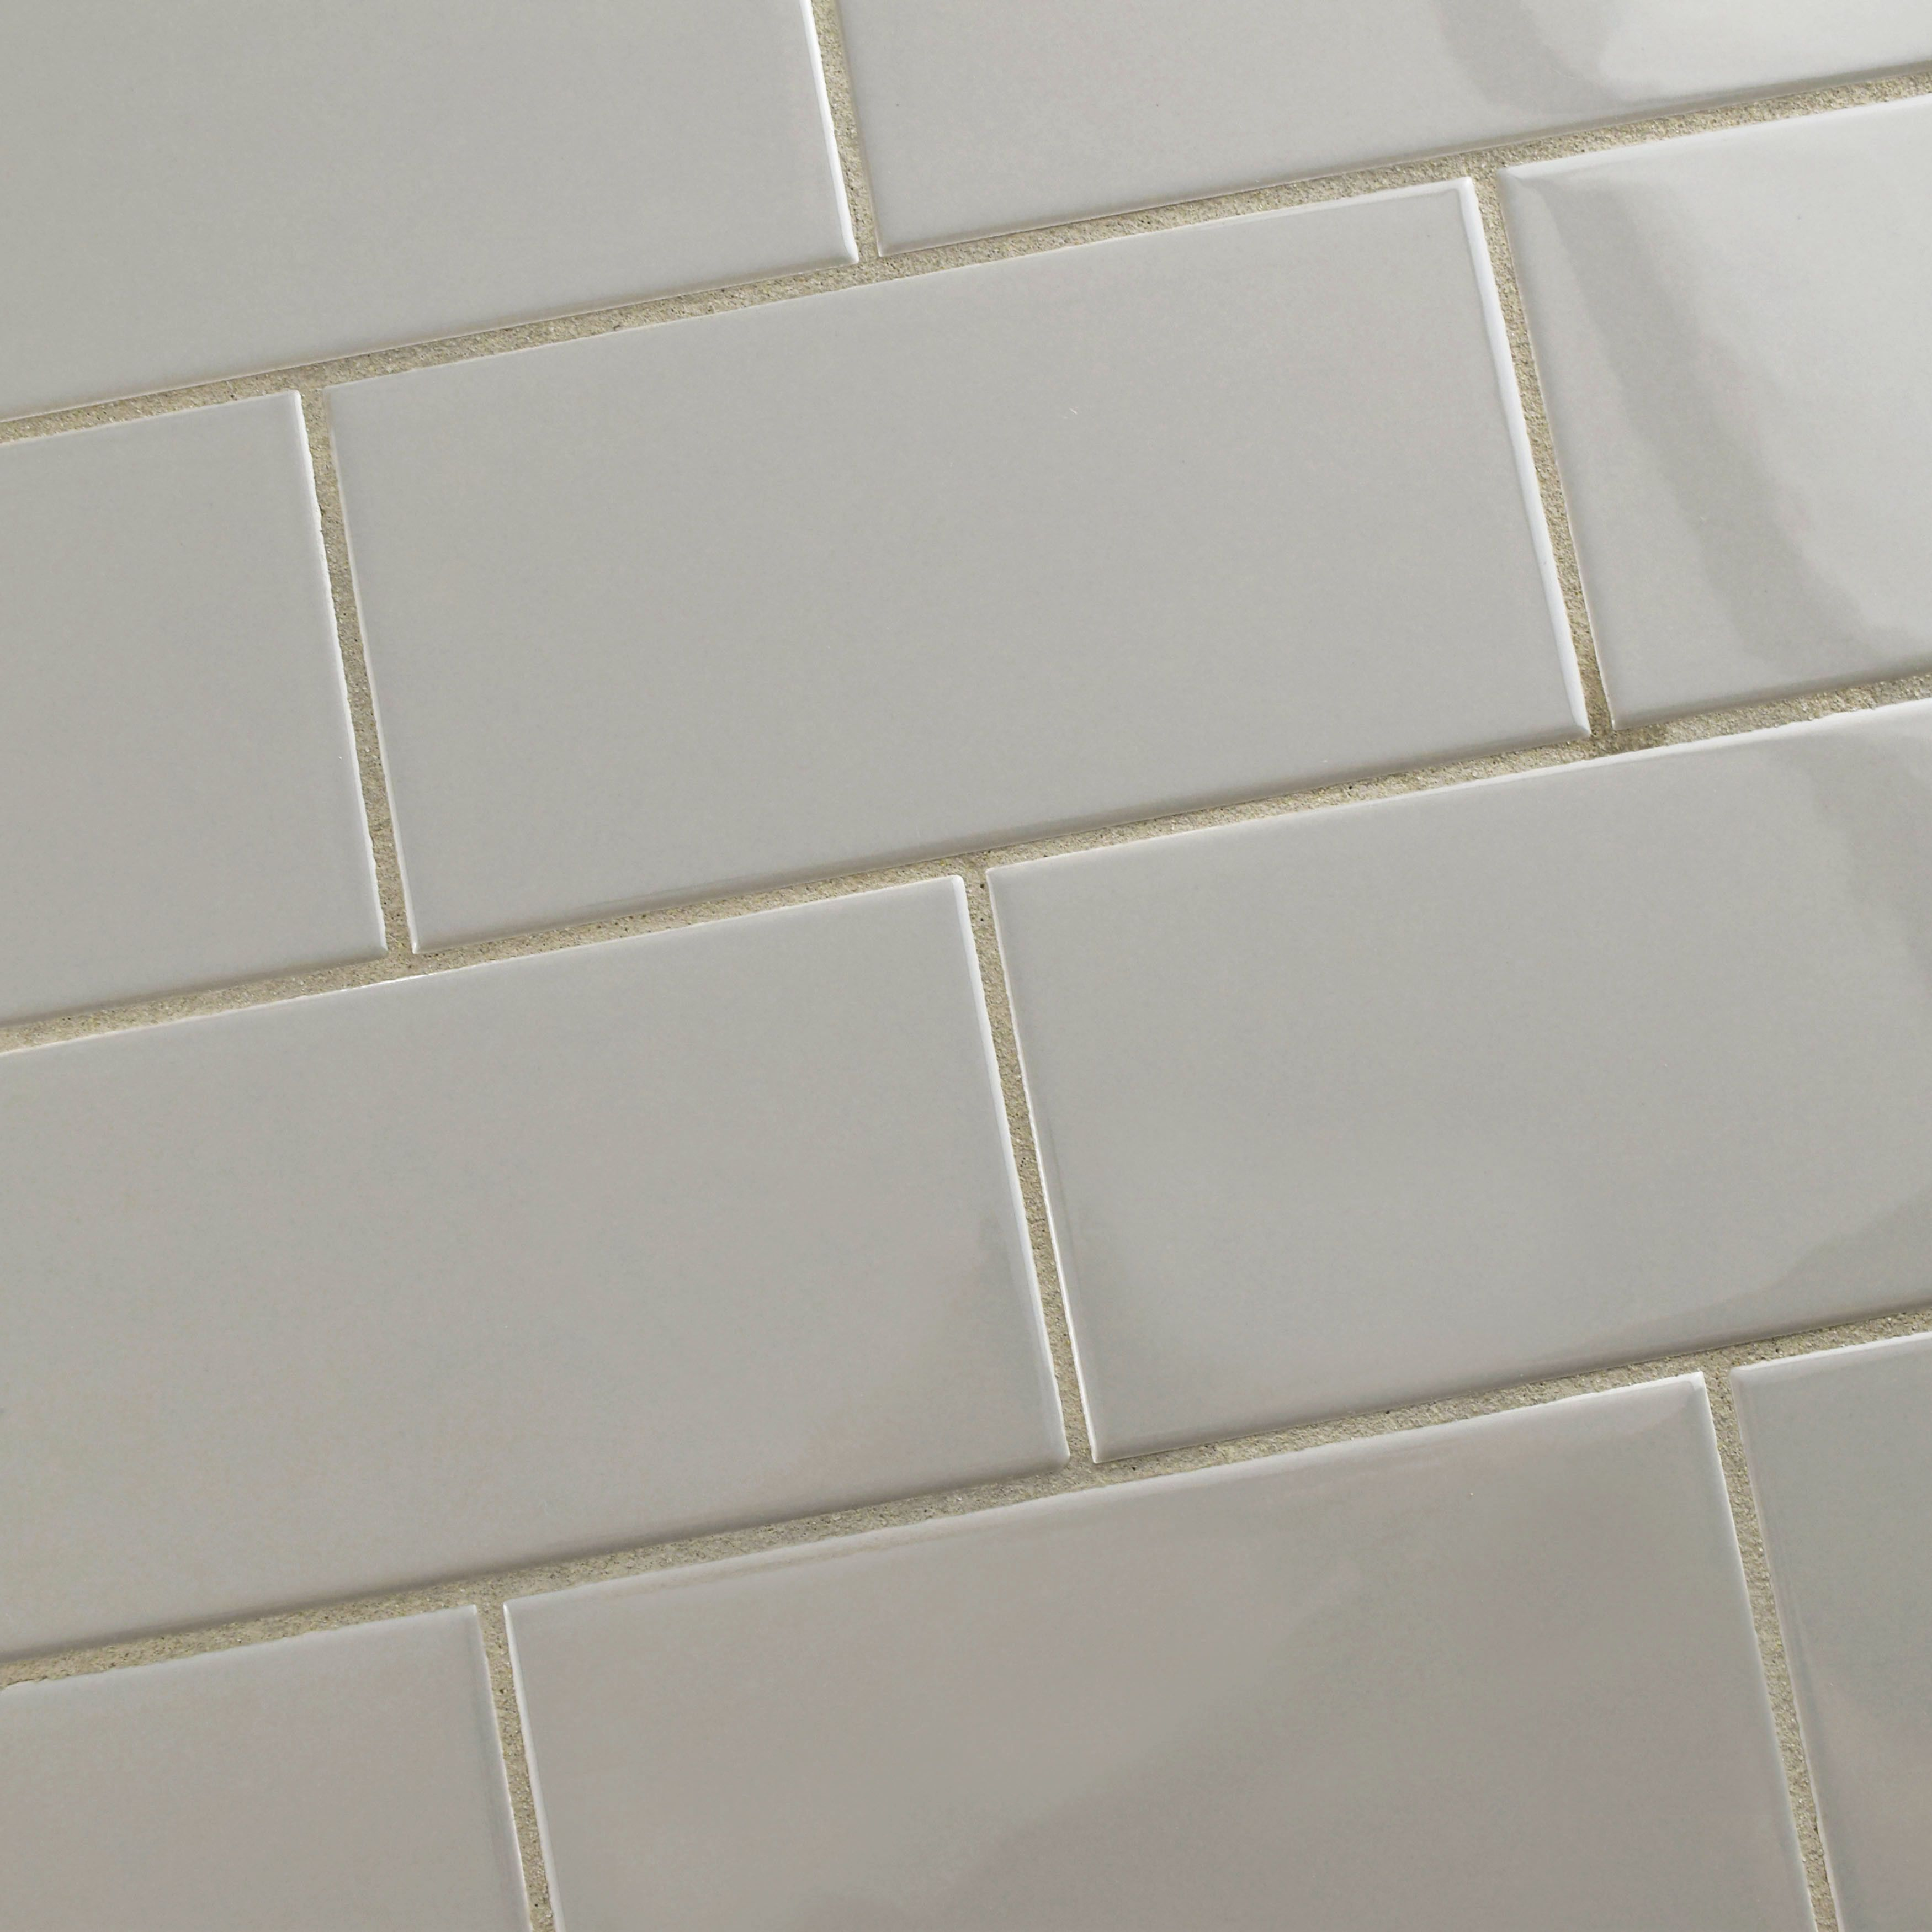 Elitetile prospect 3 x 6 ceramic subway tile in gray home elitetile prospect 3 x 6 ceramic subway tile in gray dailygadgetfo Choice Image